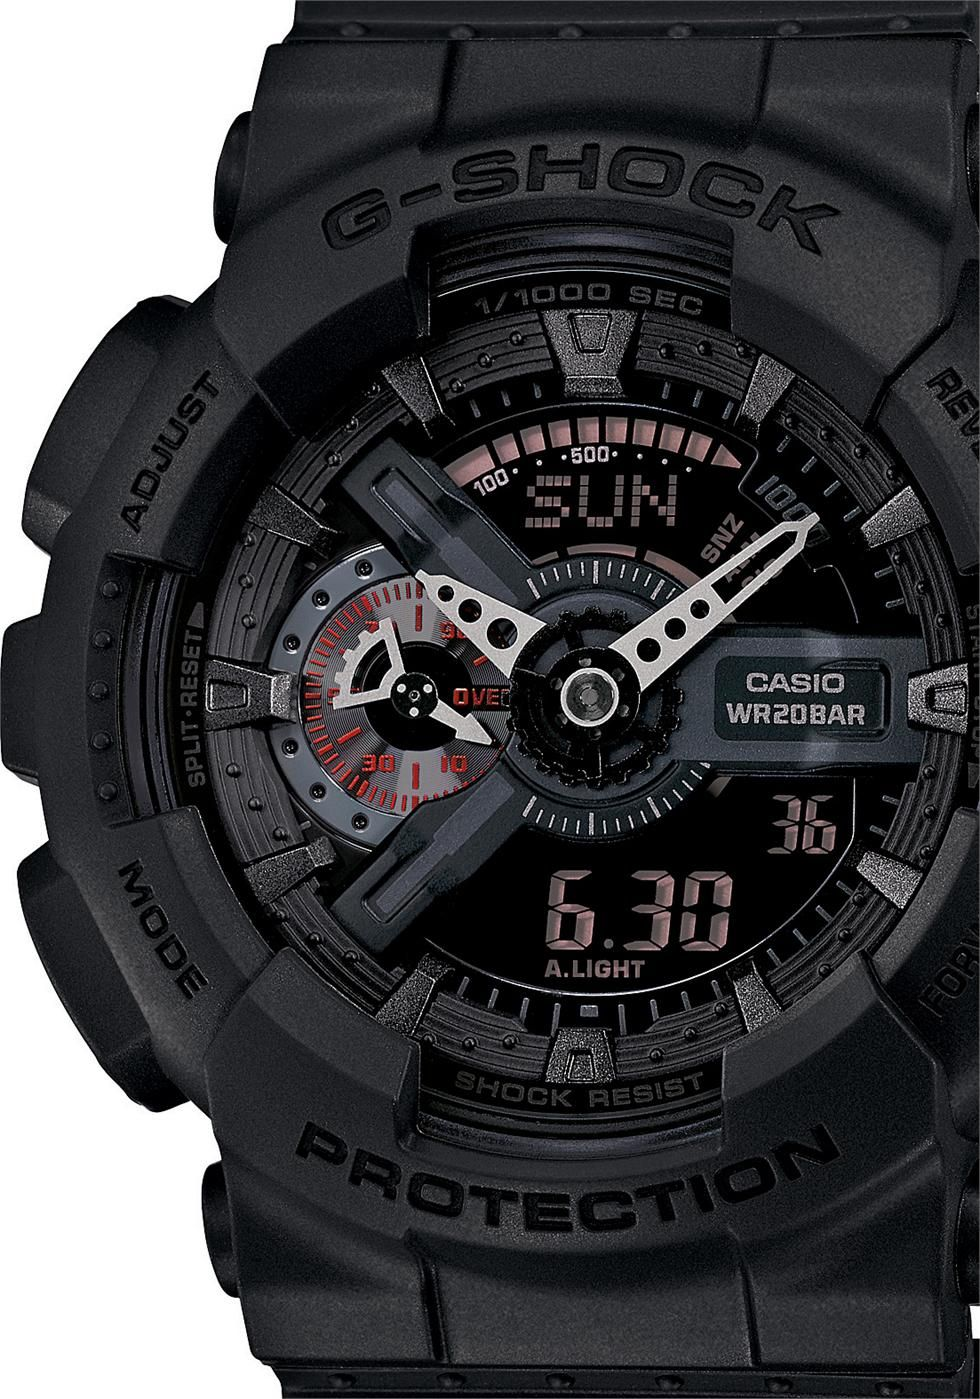 a6cf1d9aa1451a G-Shock Classic Military X-Large Matte Black | Watch | Casio g shock ...